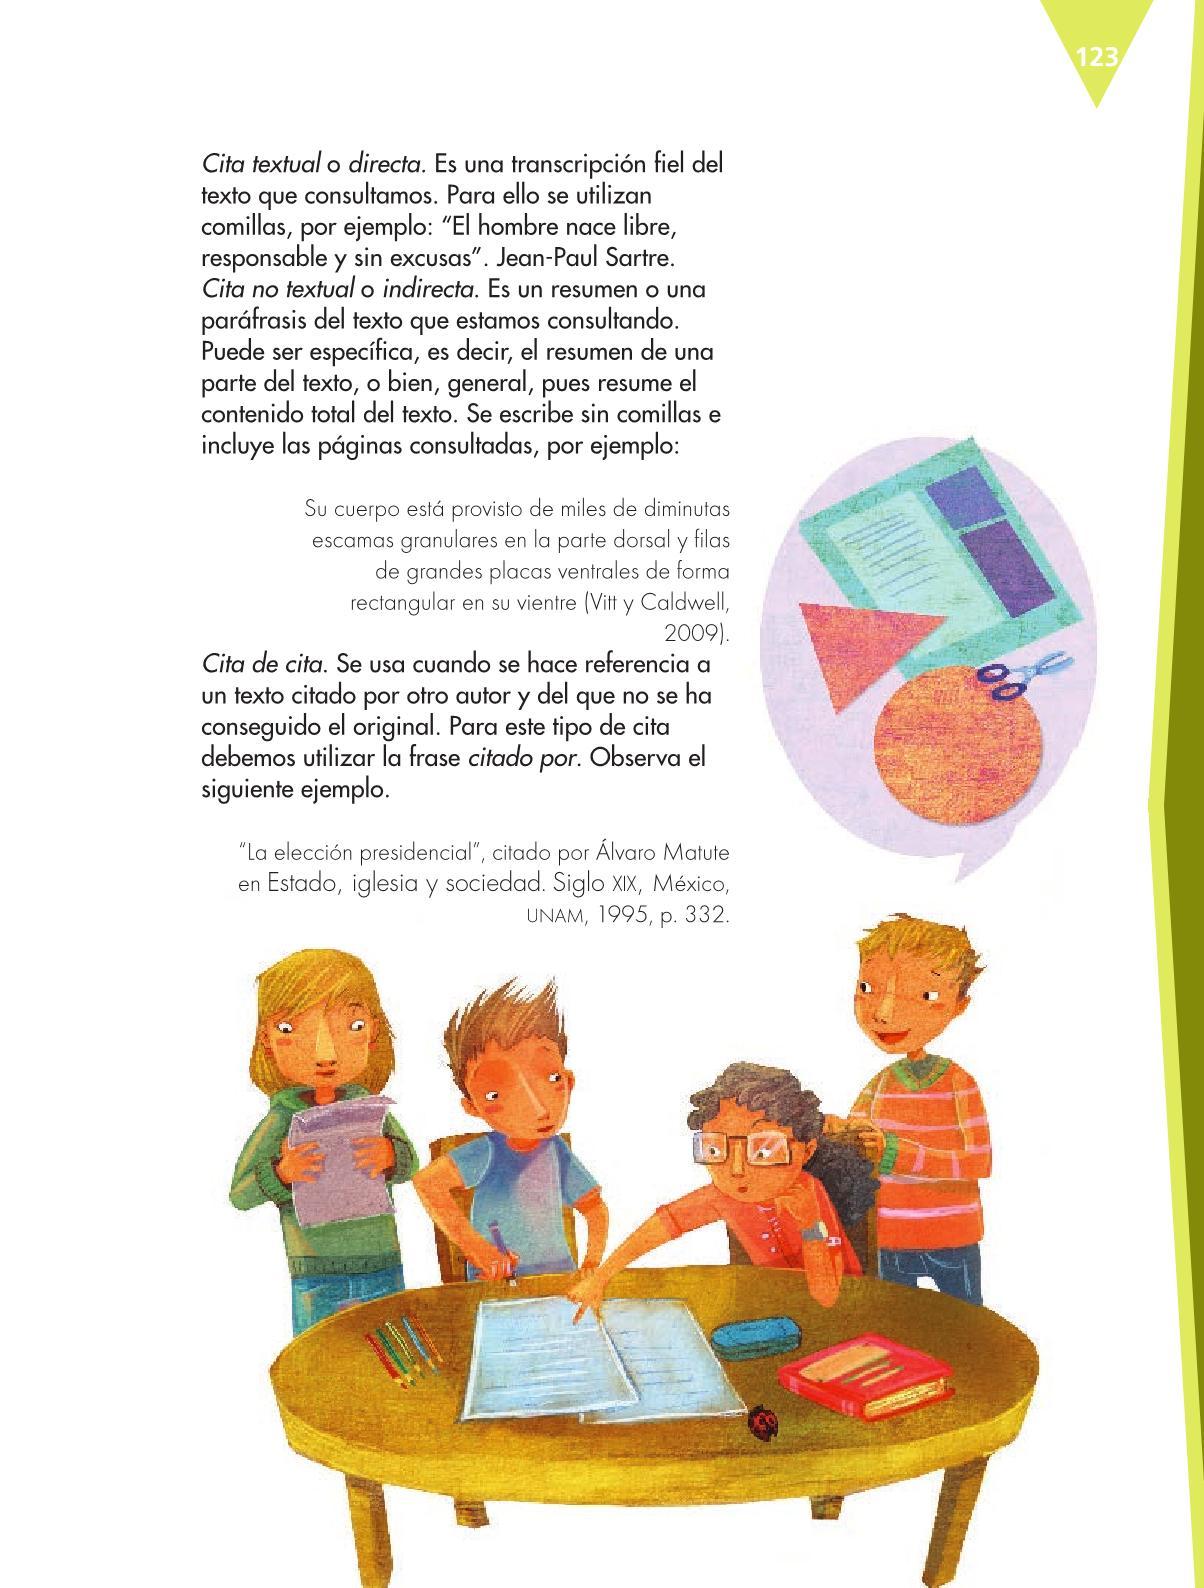 Español Libro para el alumnoquintoPagina 123